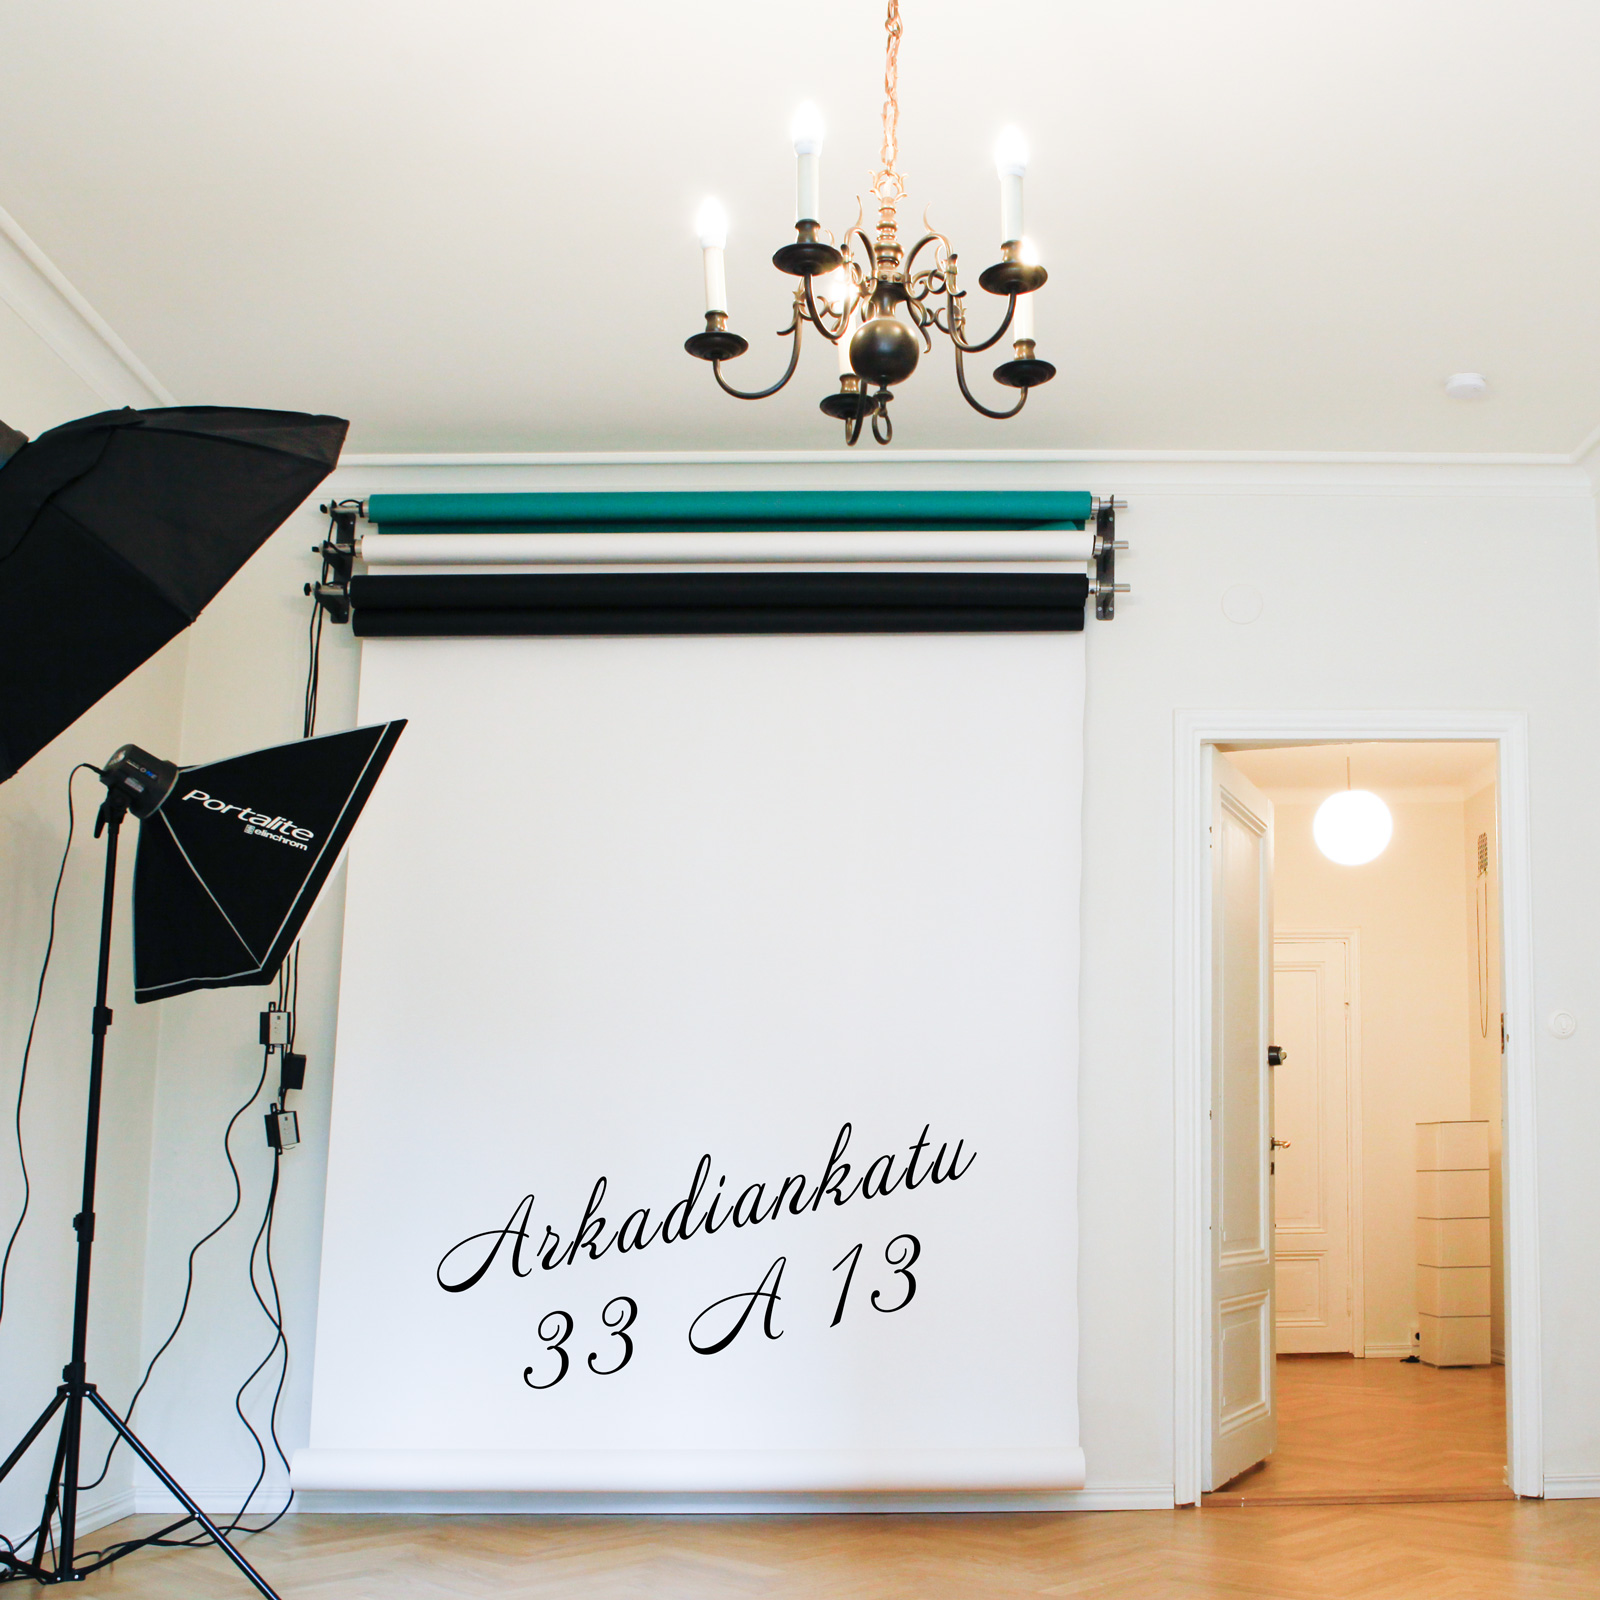 Studio Arkadiankatu